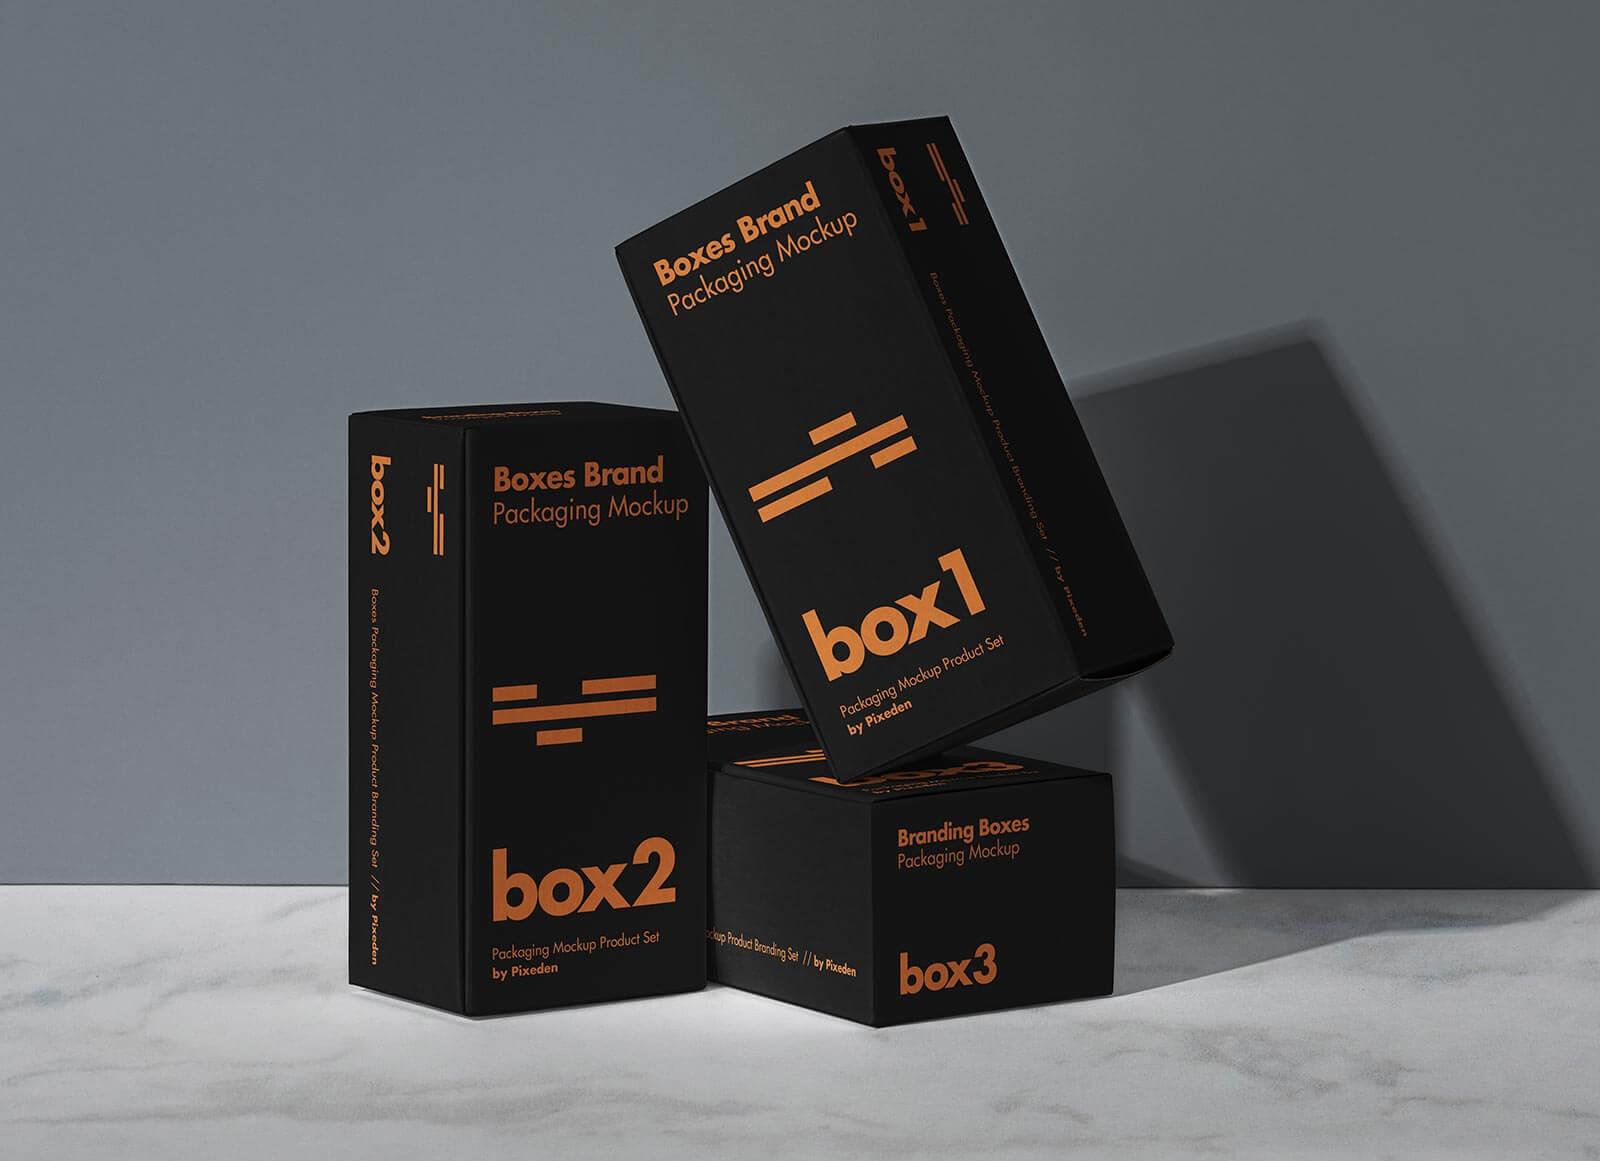 Free Cuboid Product Box Packaging Presentation Mockup PSD